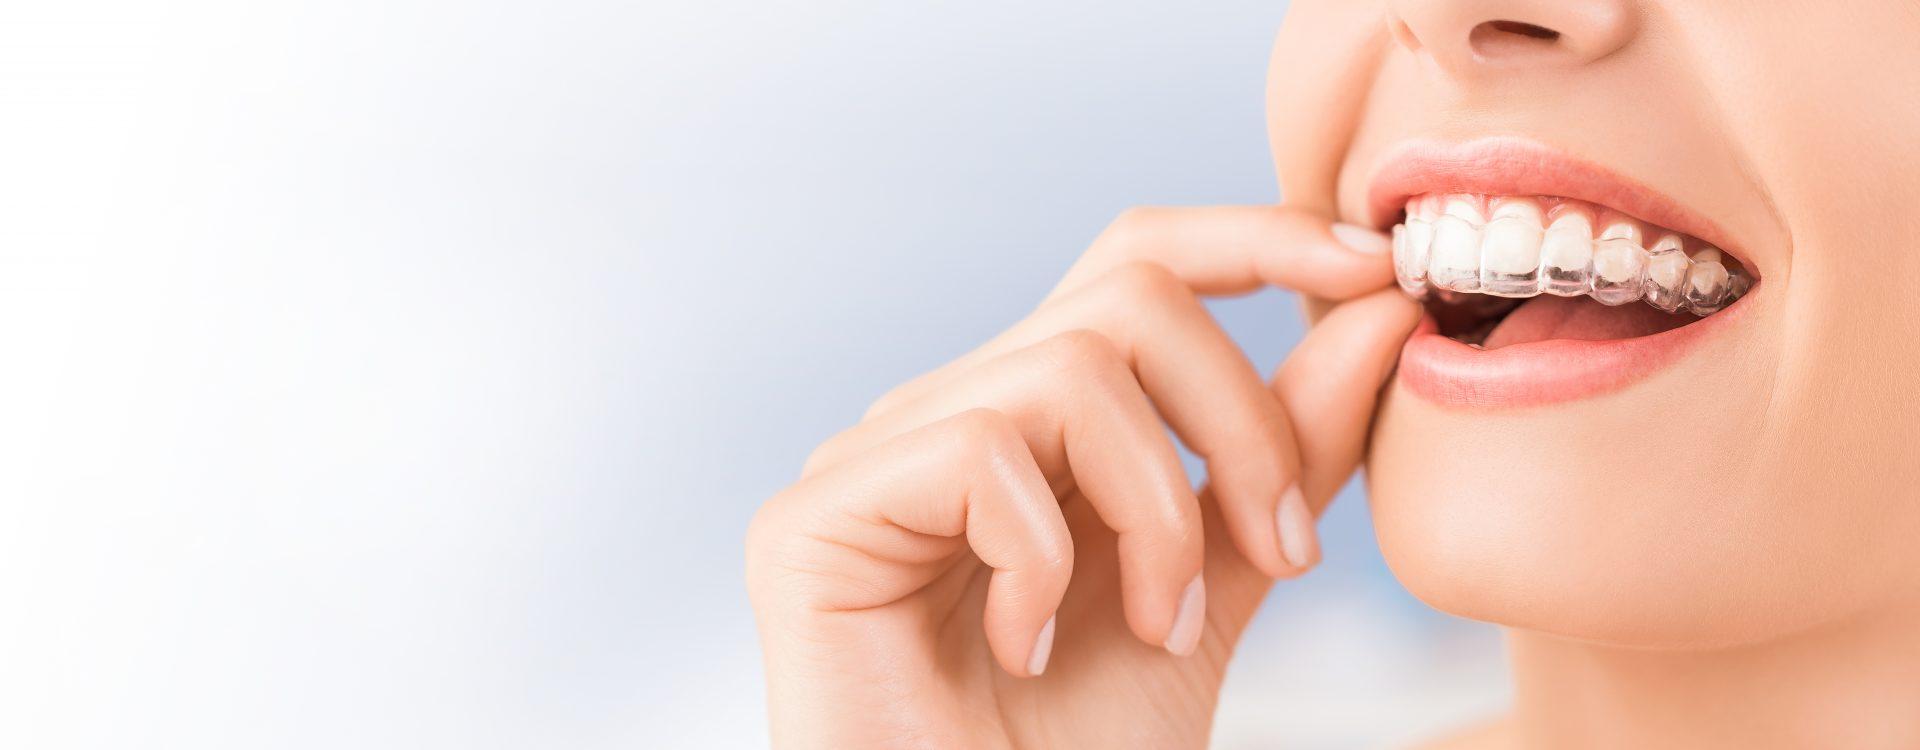 ortodoncia-invisible-ventajas